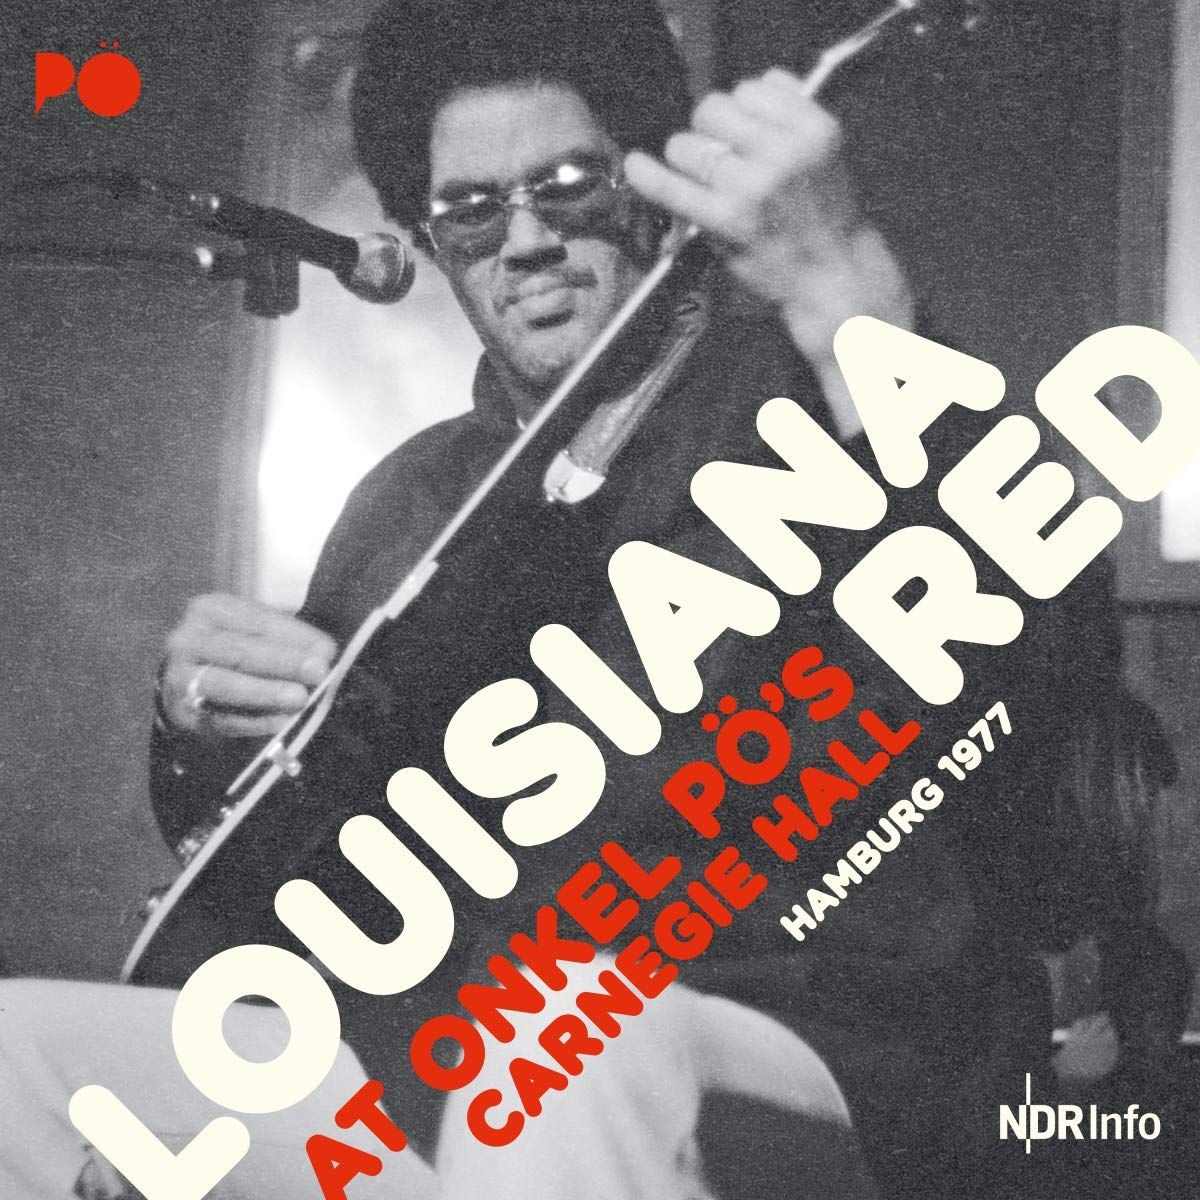 Vinilo : Louisiana Red - At Onkel Po's Carnegie Hall Hamburg 1977 (2 Pack)